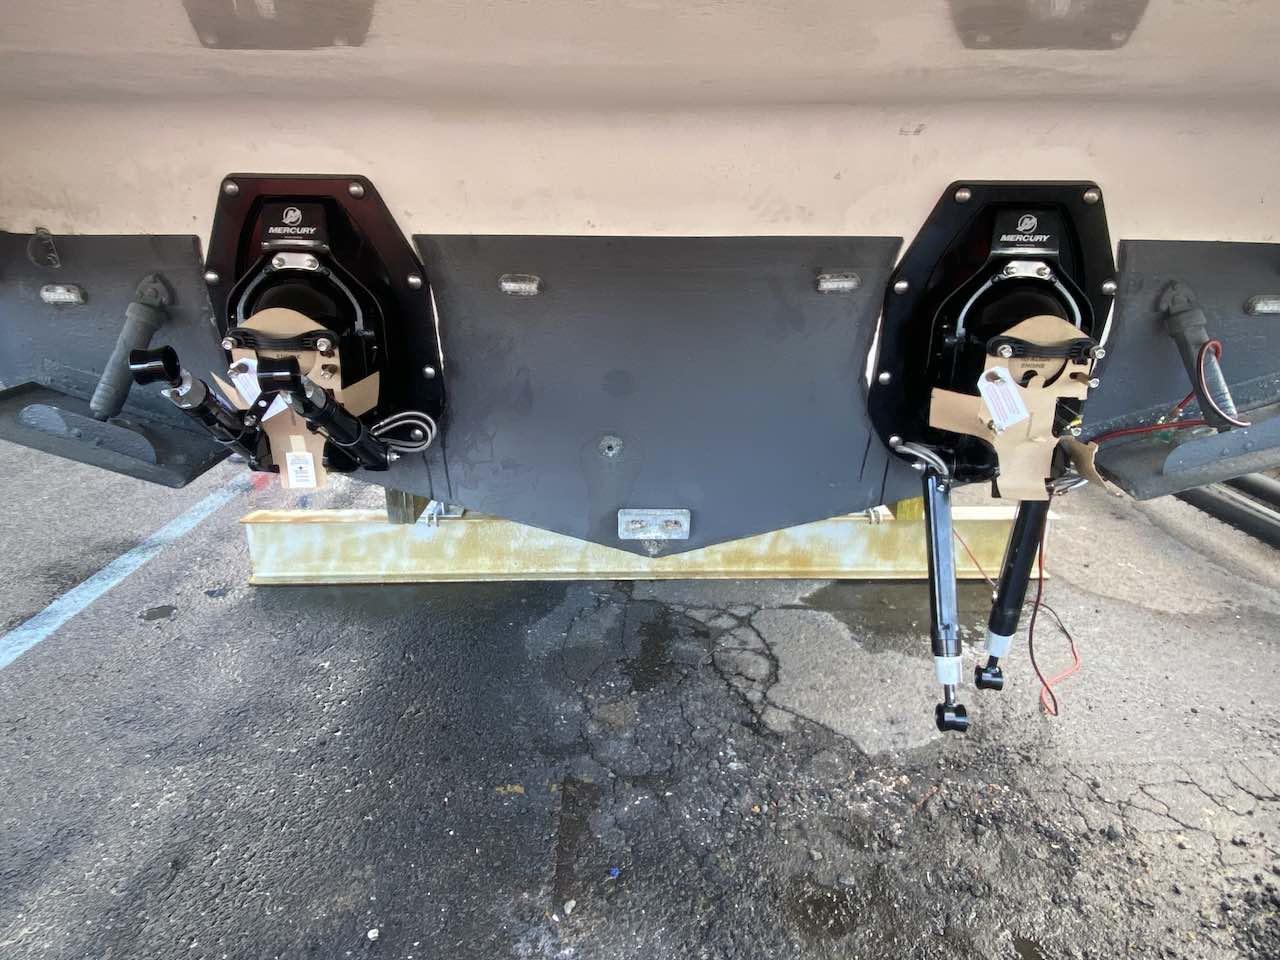 Two Mercruiser Bravo transom assemblies